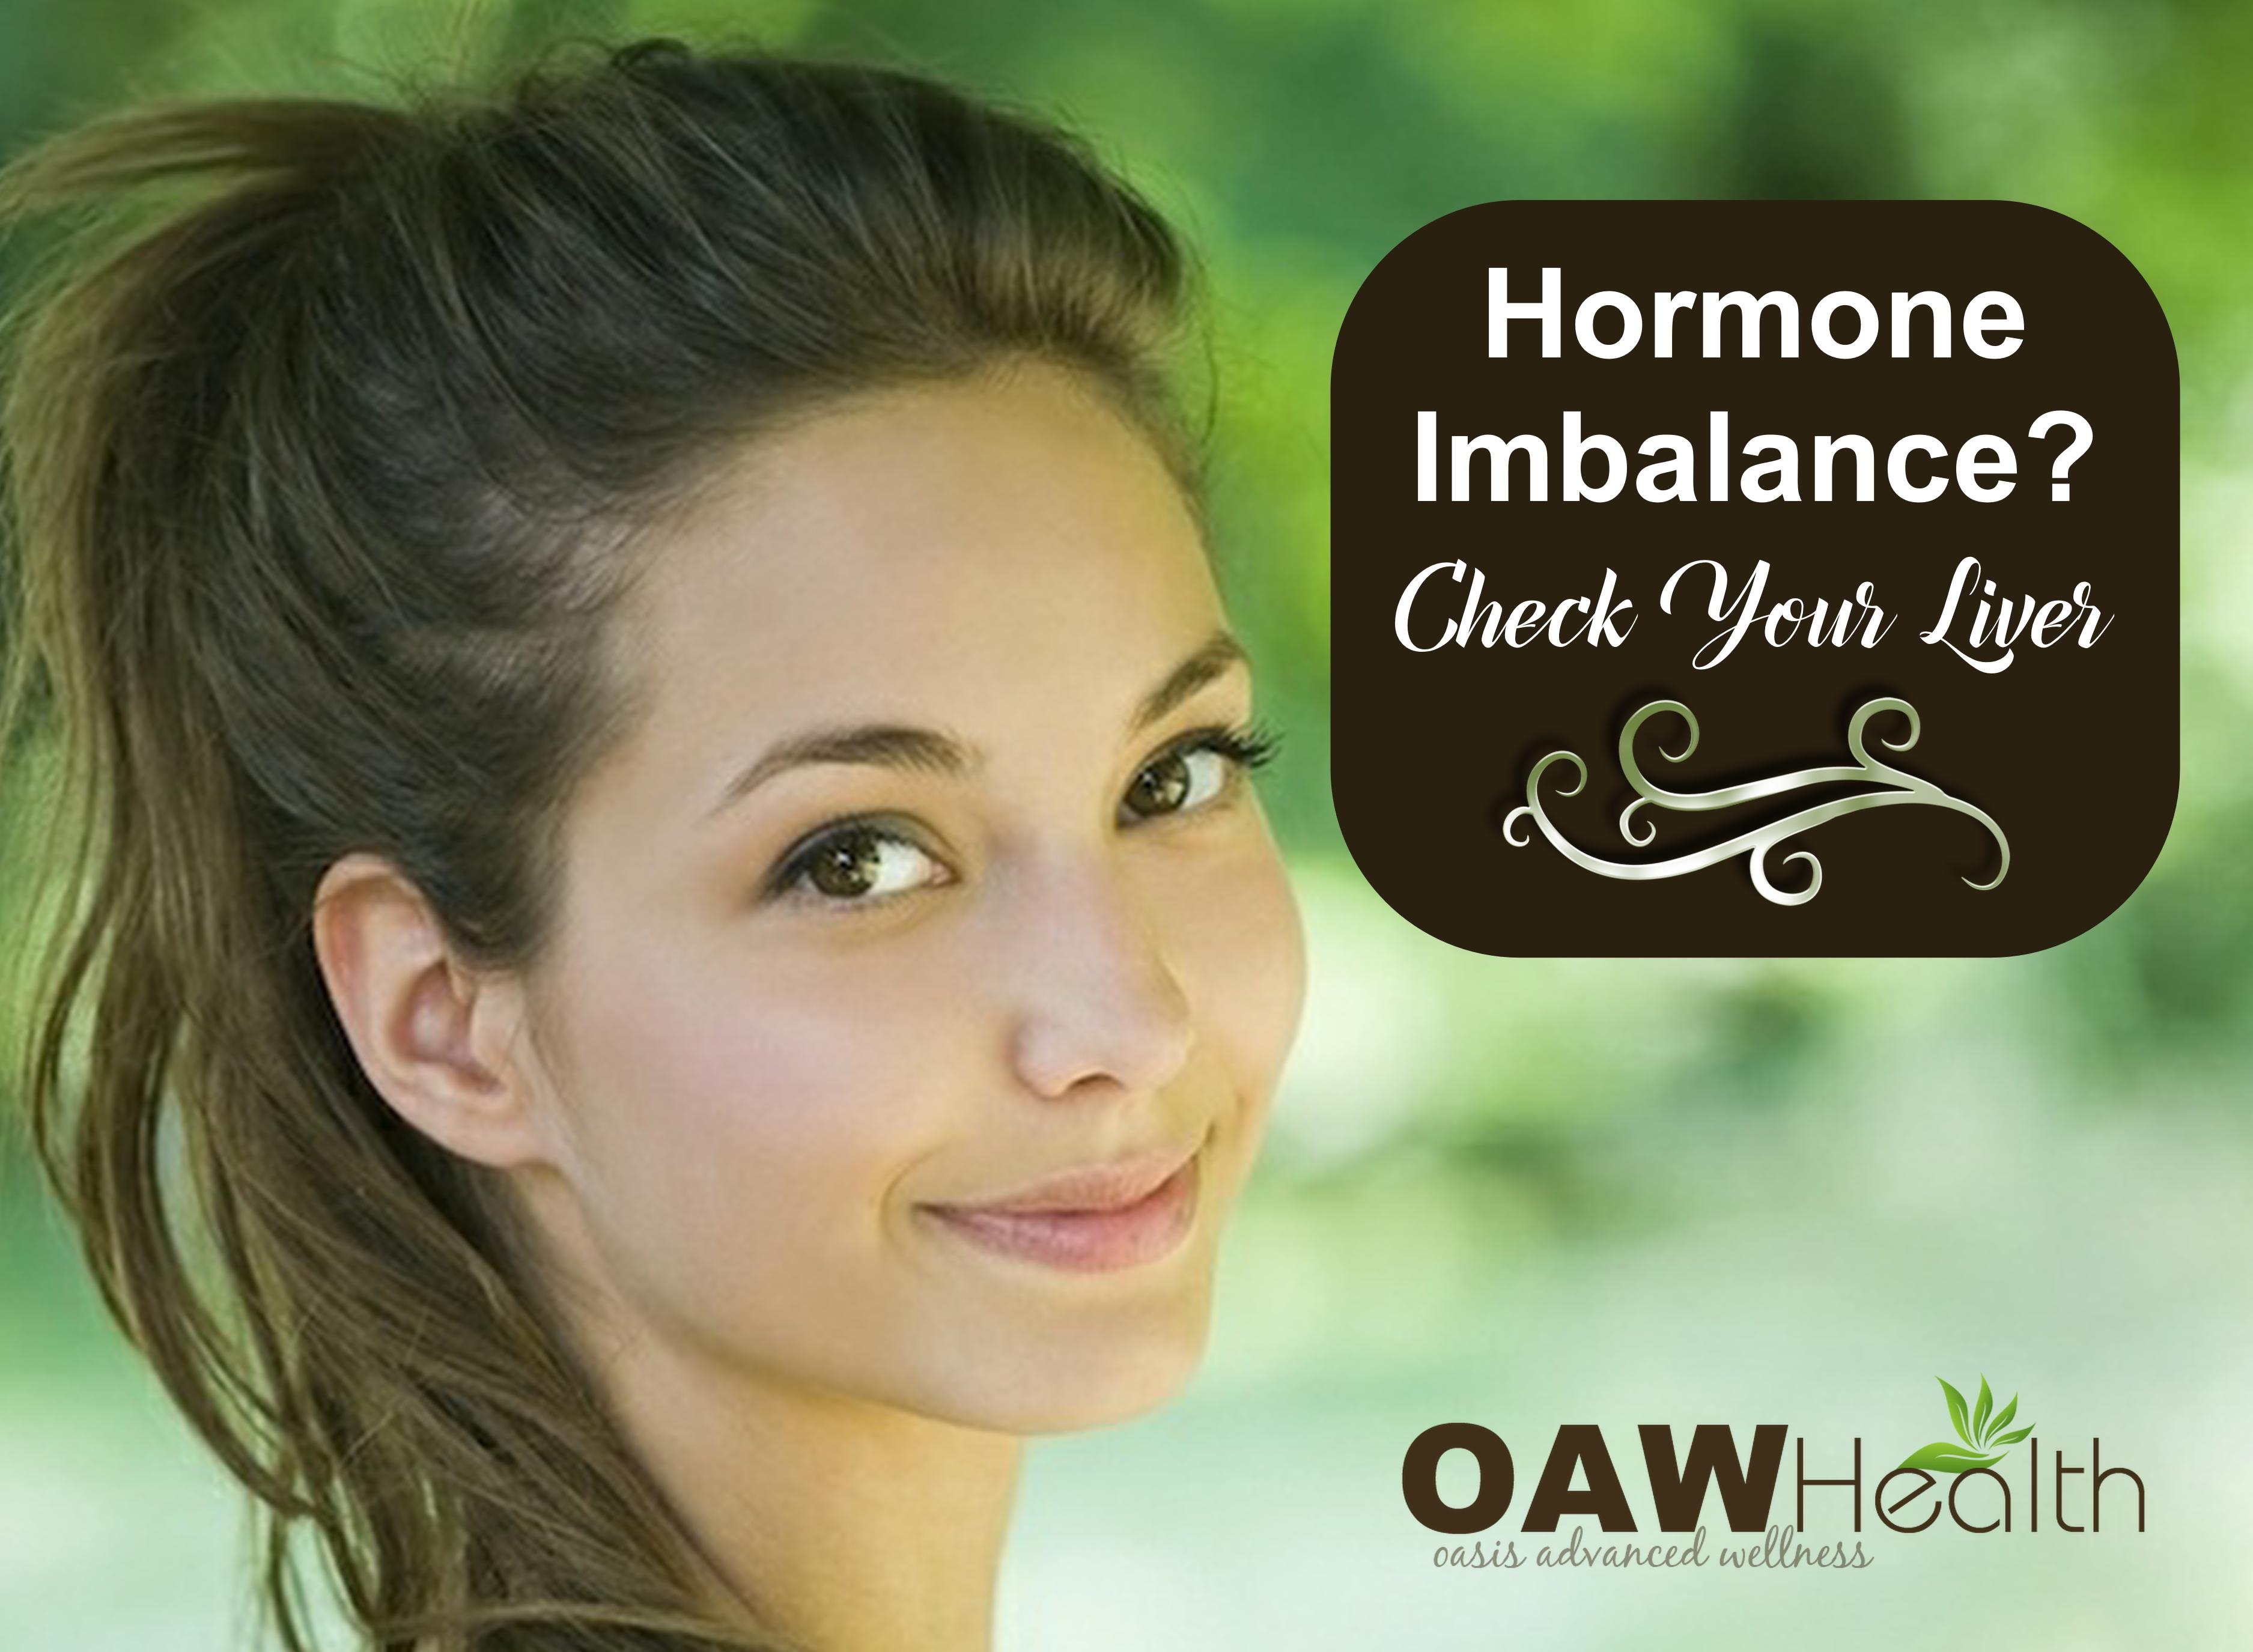 Hormone Imbalance – Check Your Liver